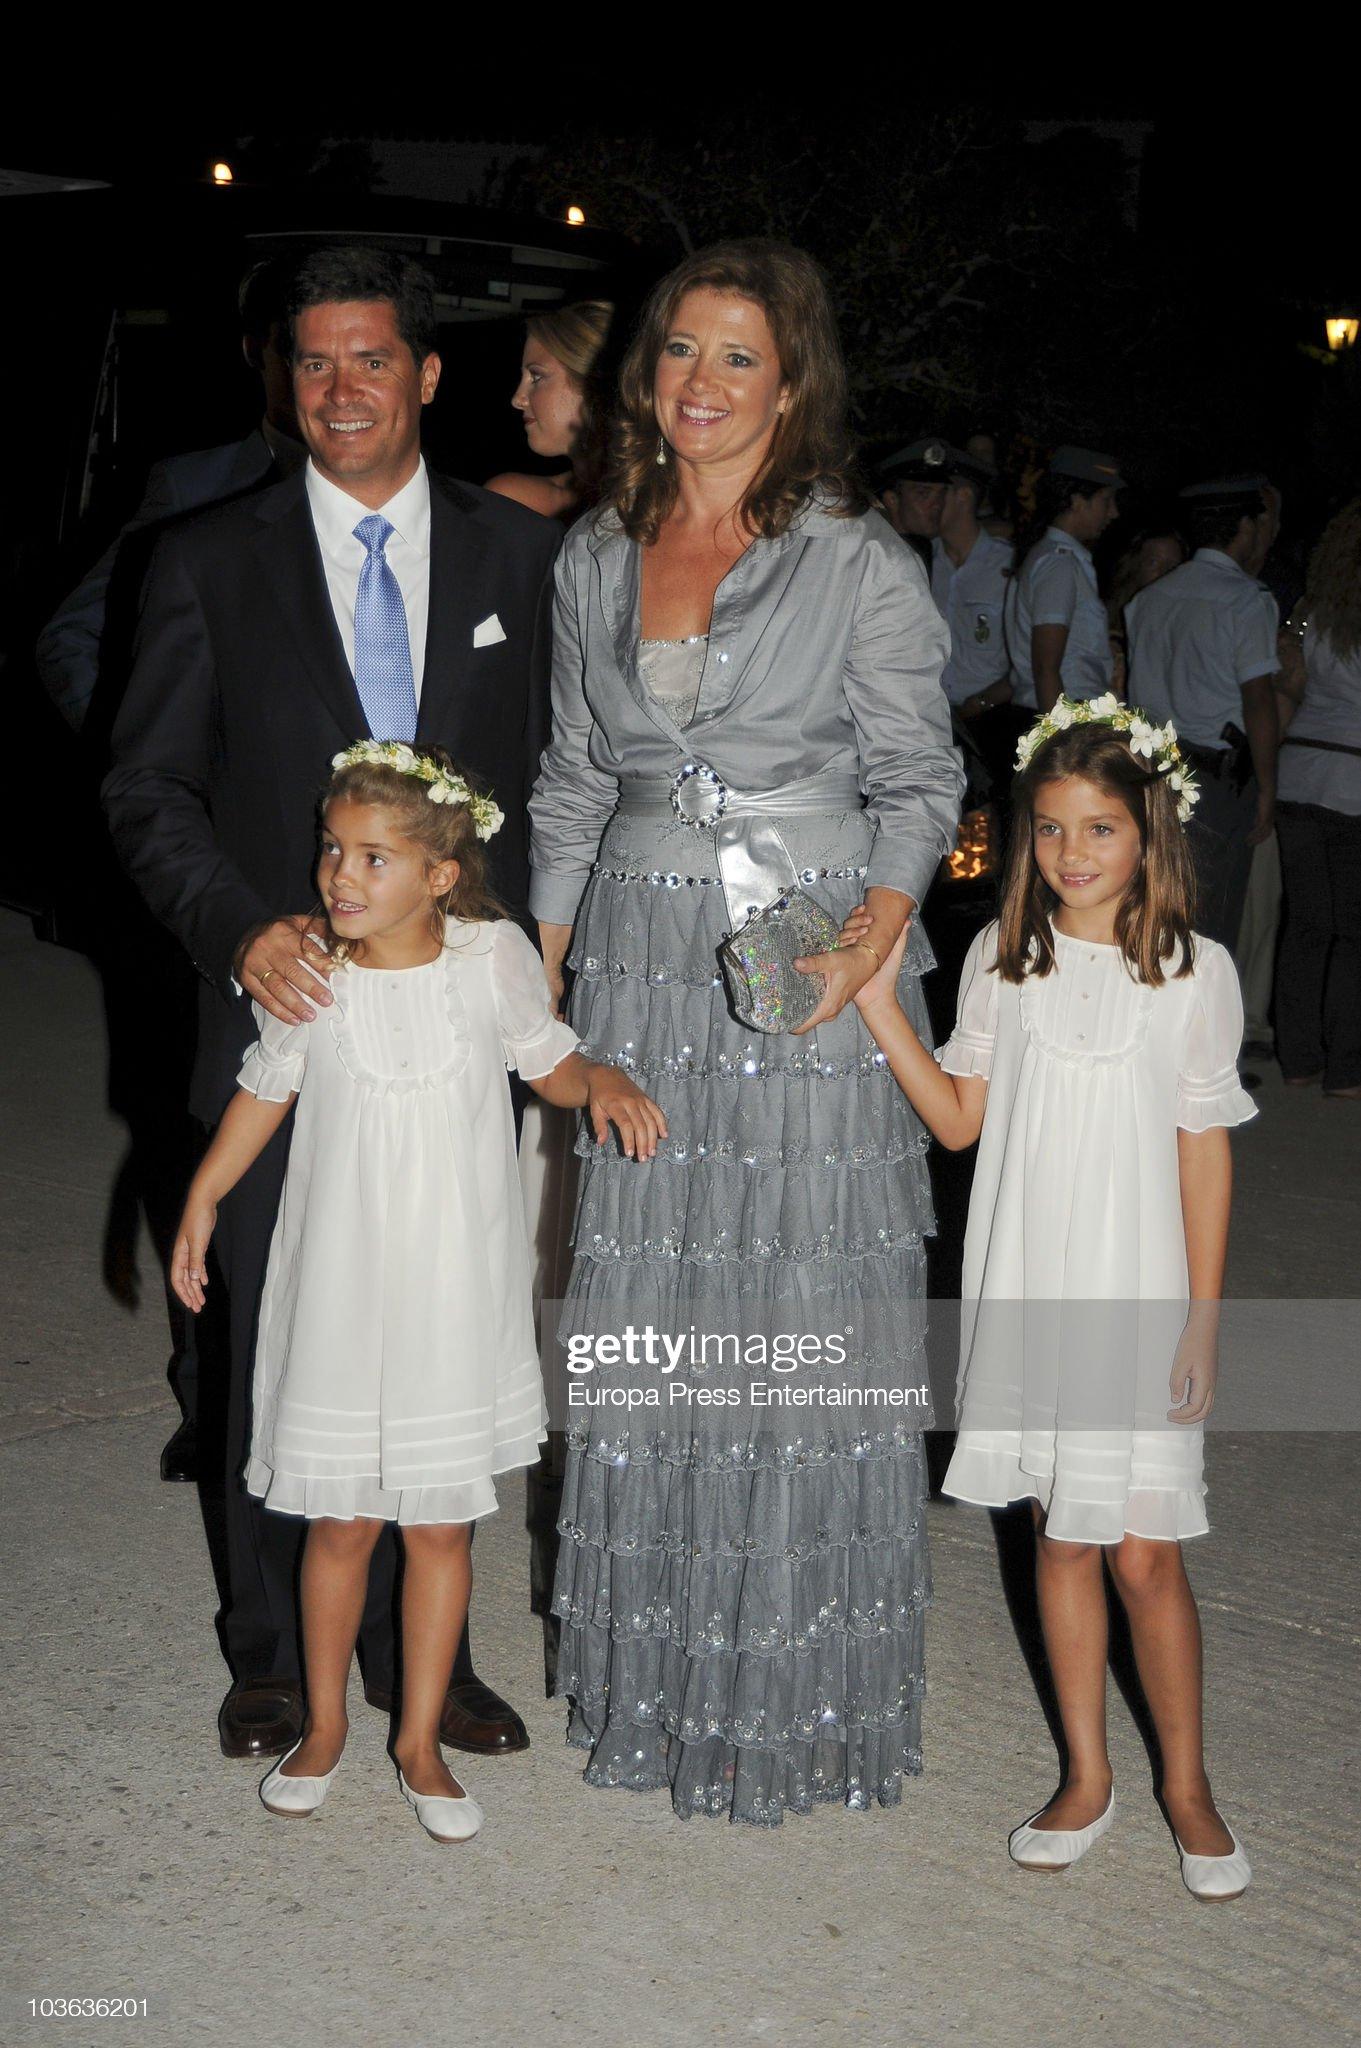 Wedding of Prince Nikolaos and Tatiana Blatnik - Banquet : News Photo